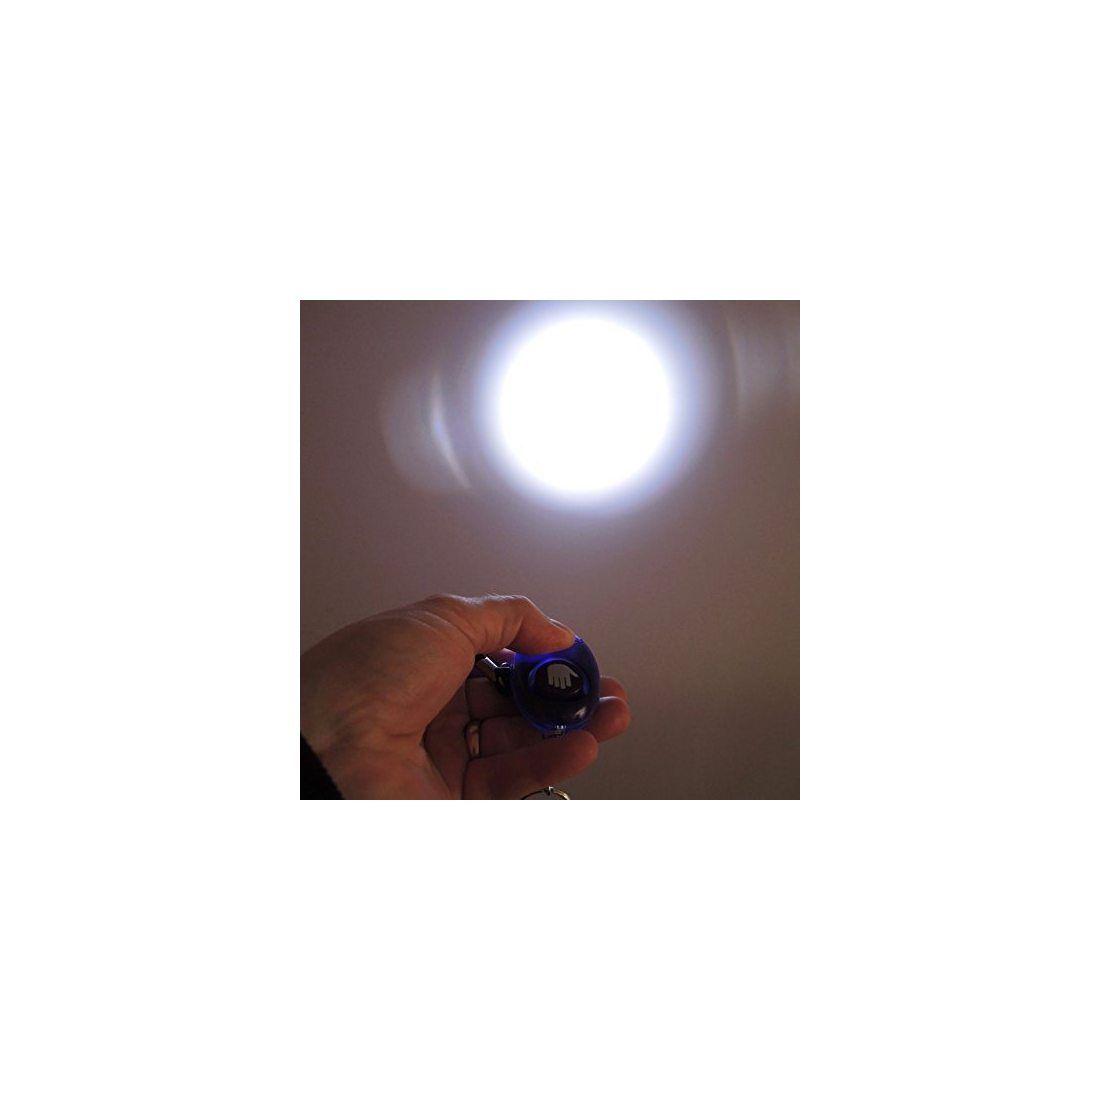 tiiwee Alarme Personnelle d'Urgence avec Torche - Deep Purple - 130dB - Anti Agression